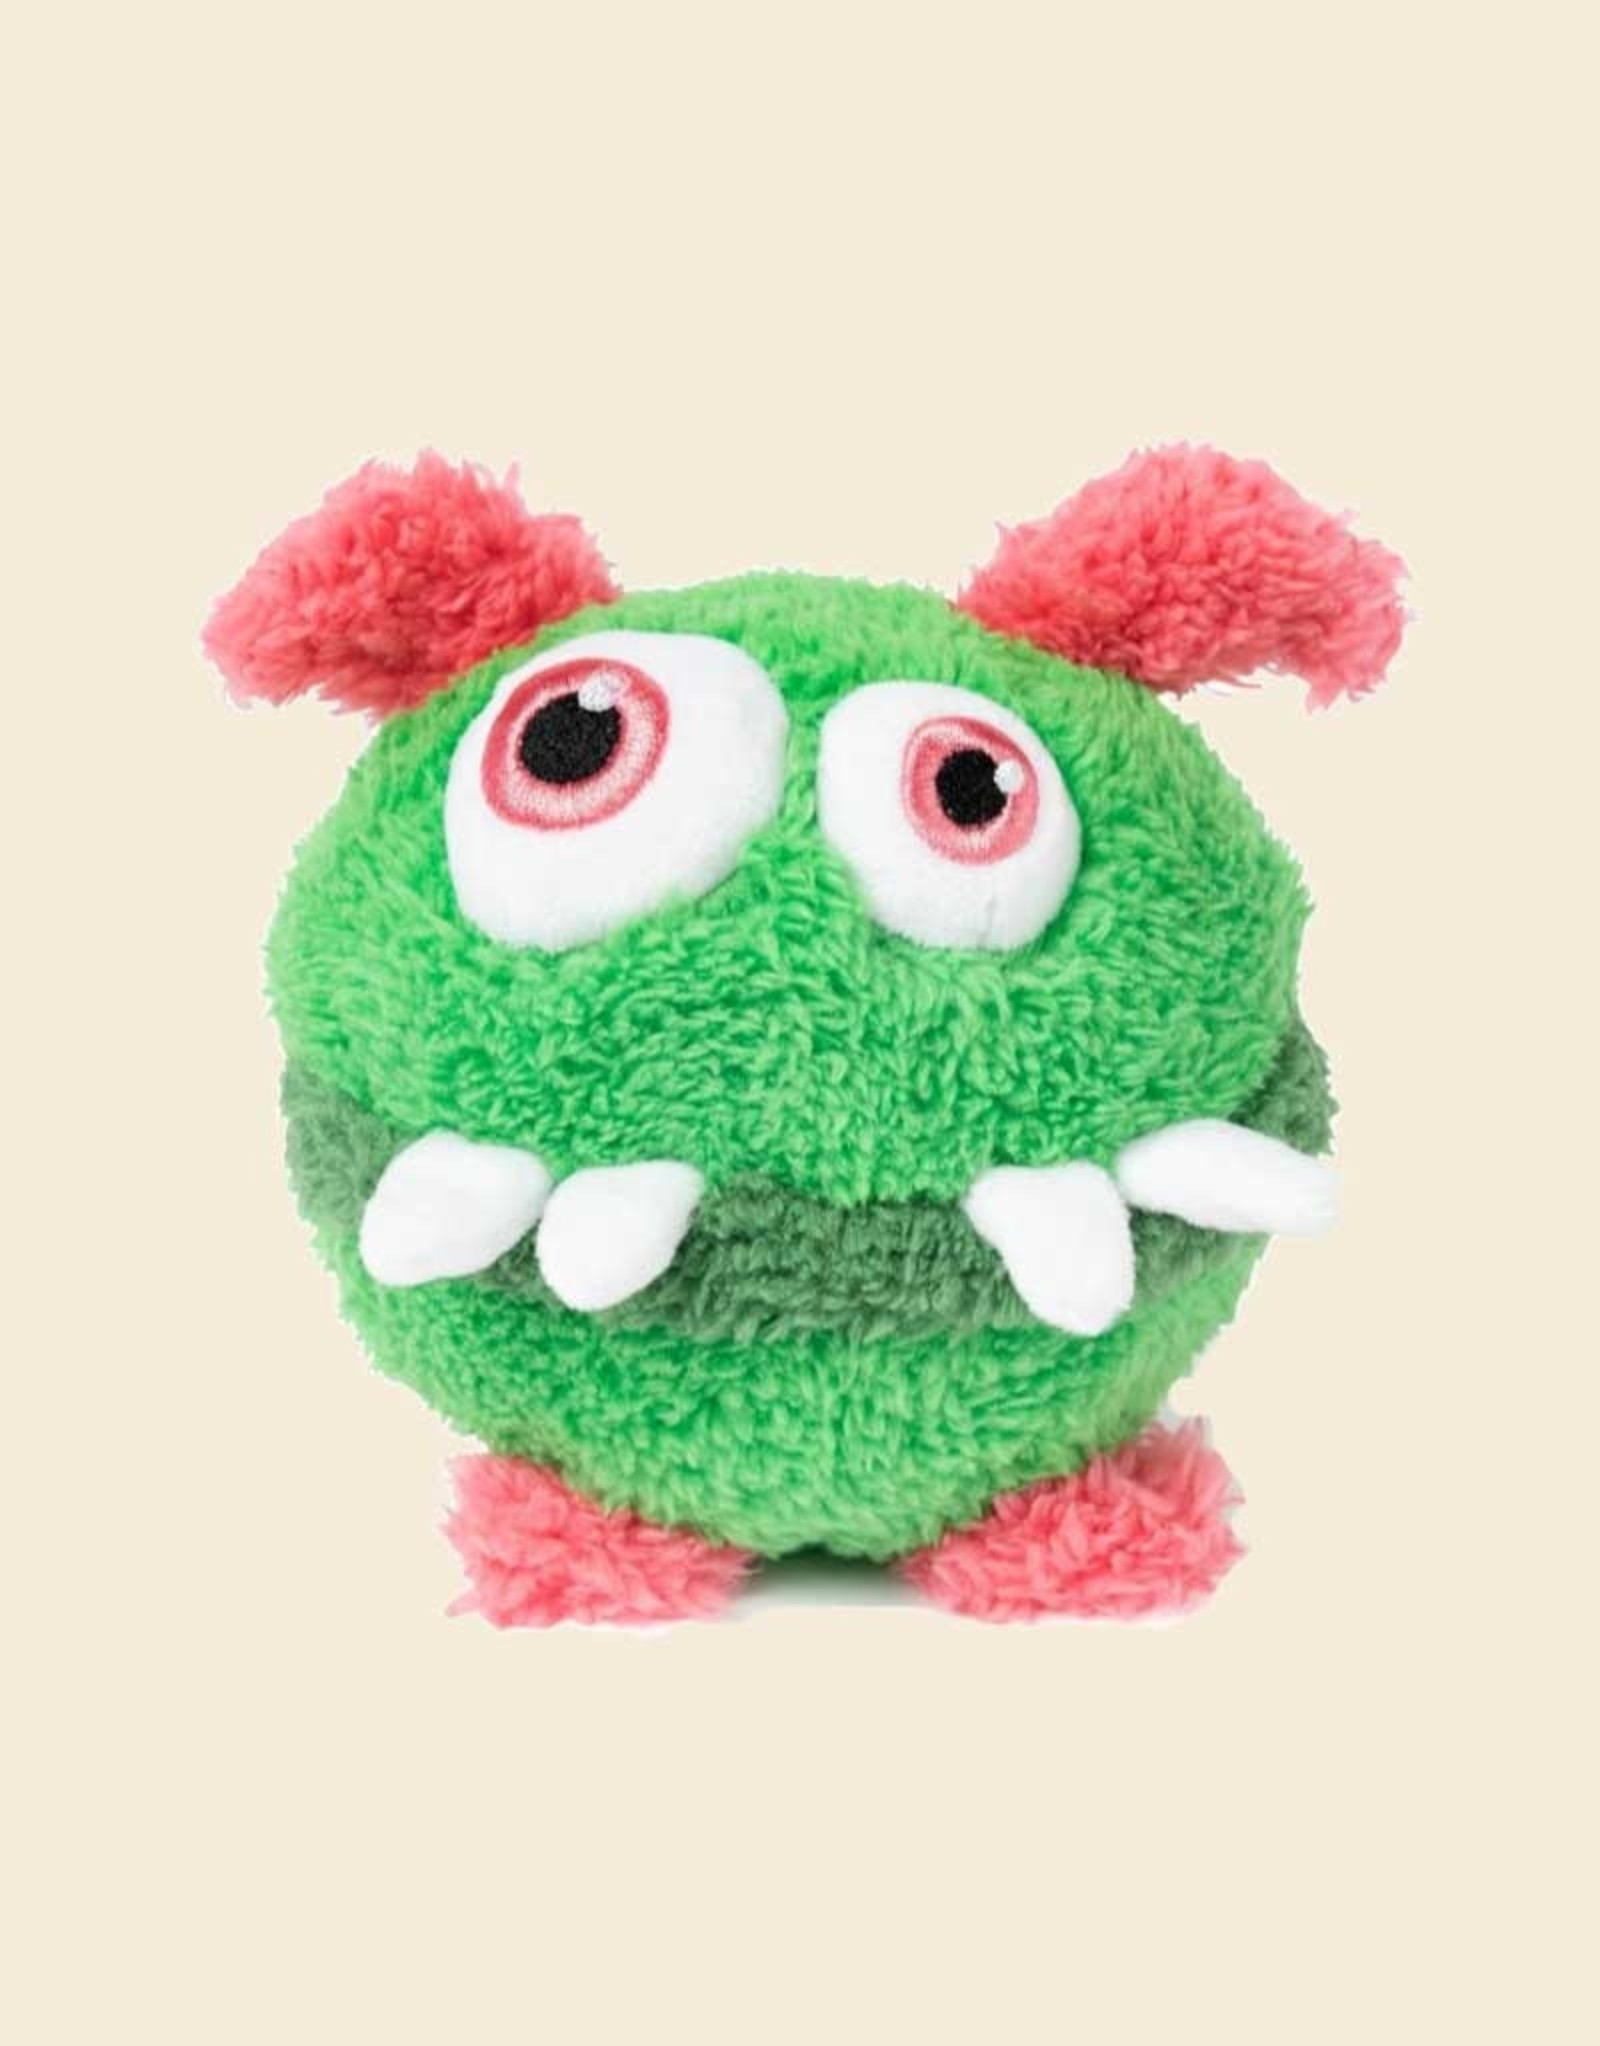 PeeWee Groen Monster l Halloween Speeltje